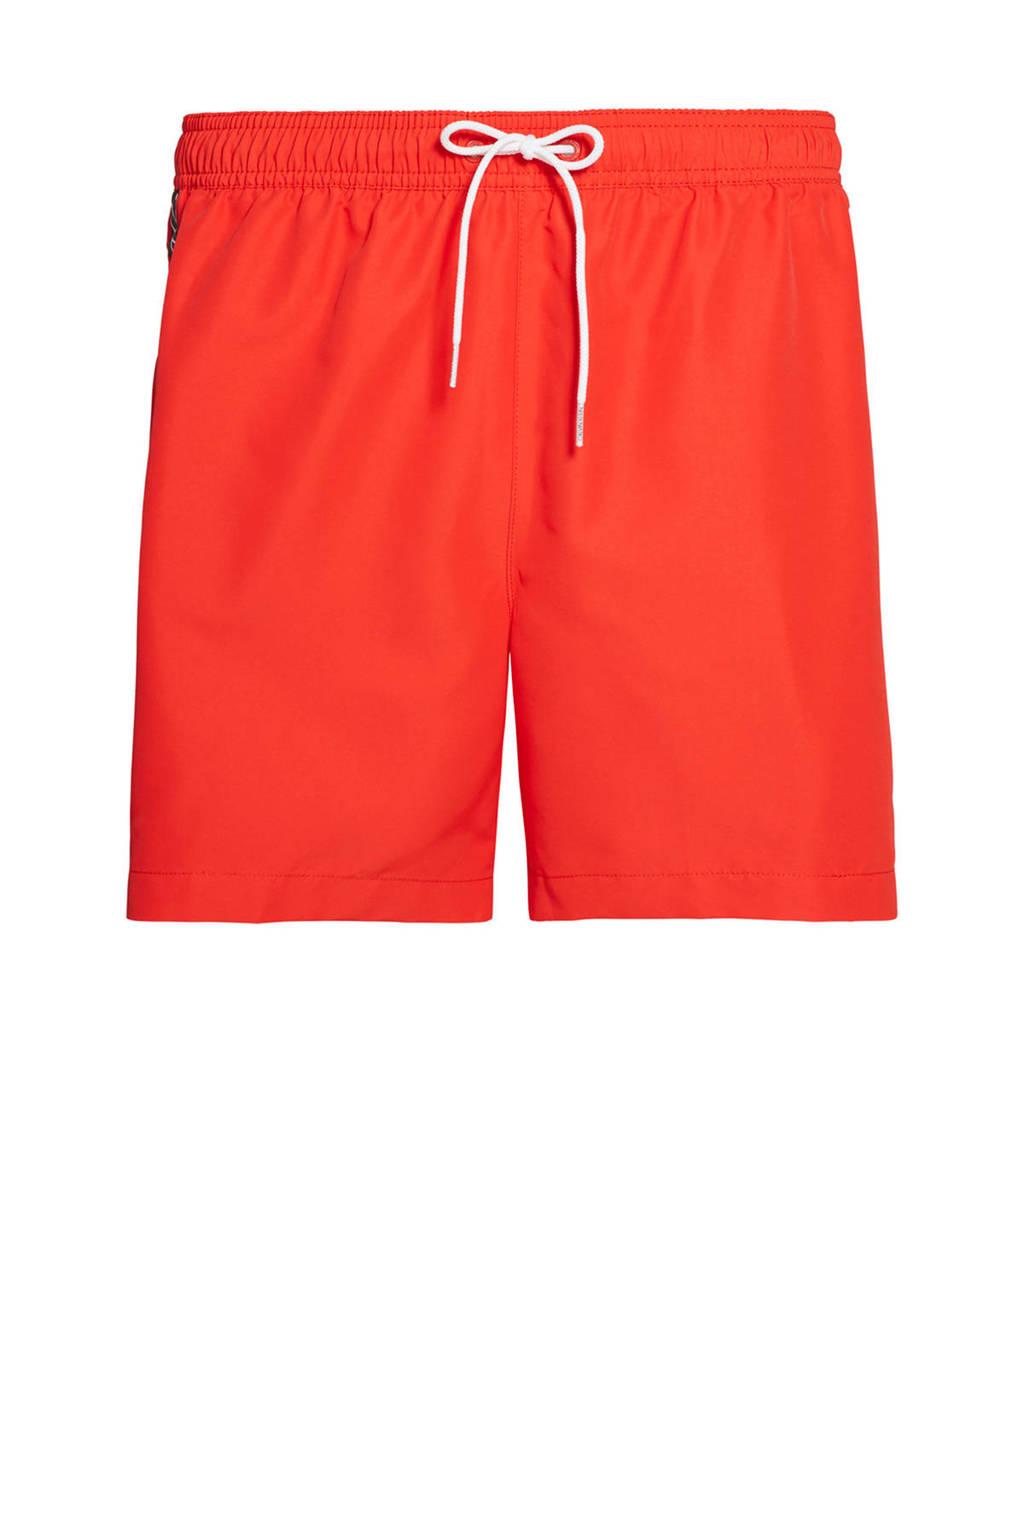 CALVIN KLEIN zwemshort oranje, Oranje